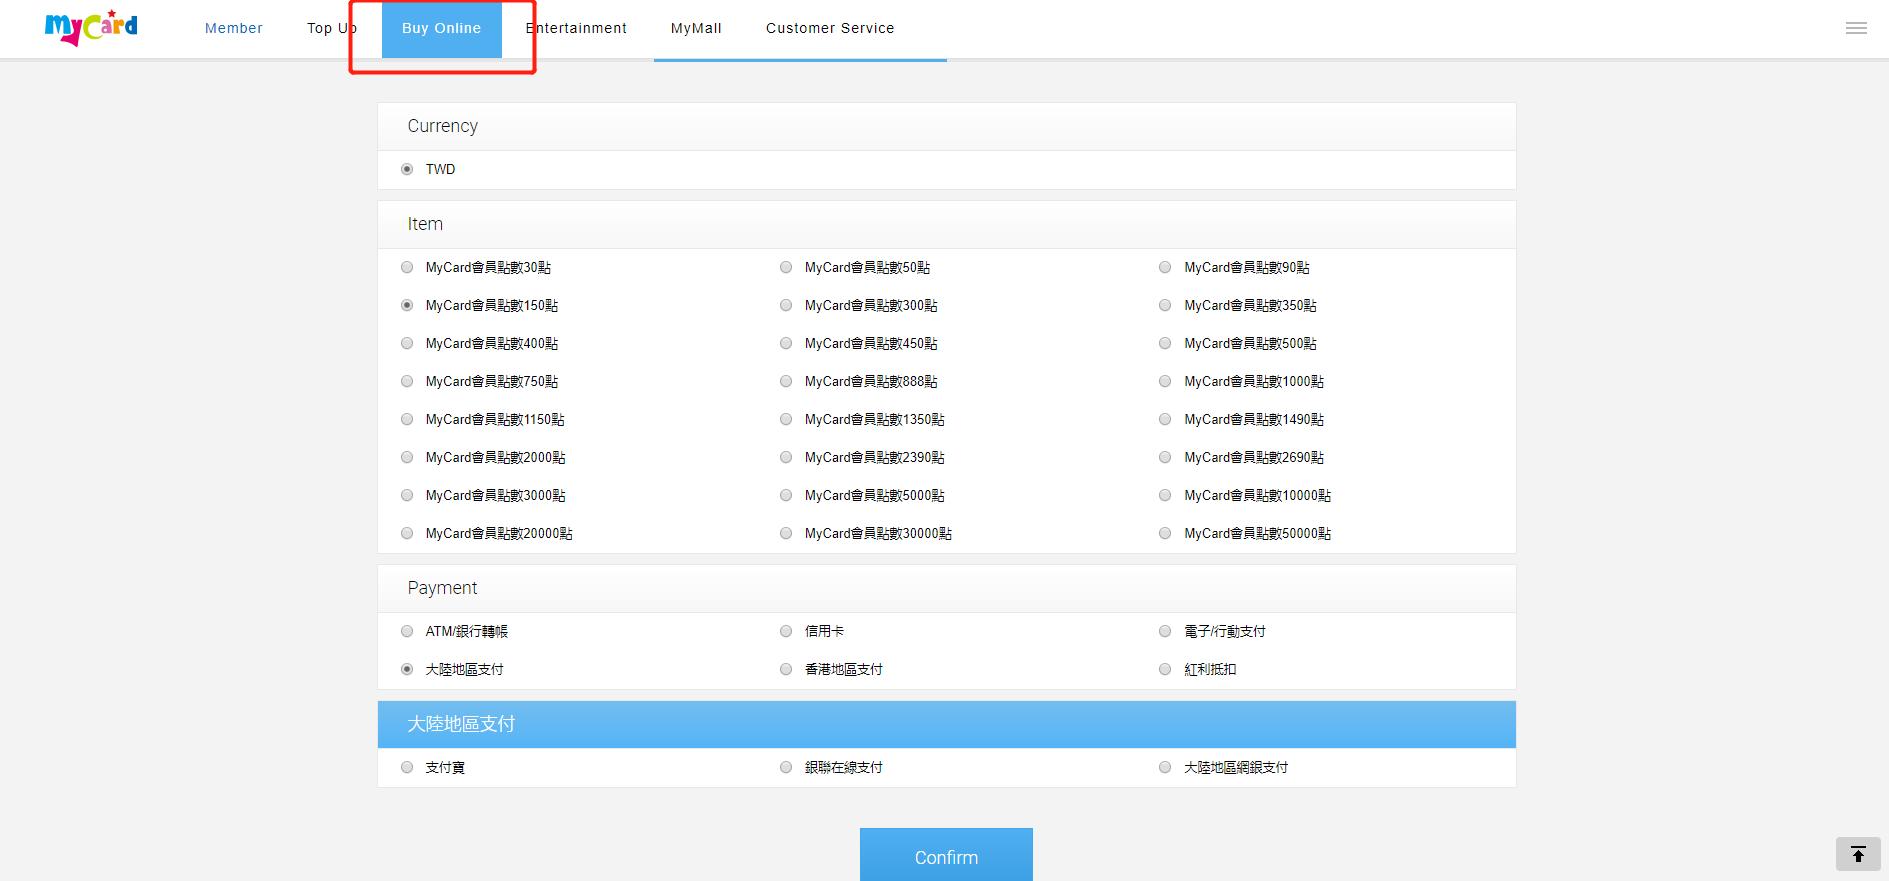 Mycard储值活动详细流程指南-登录后进行点数储值.png